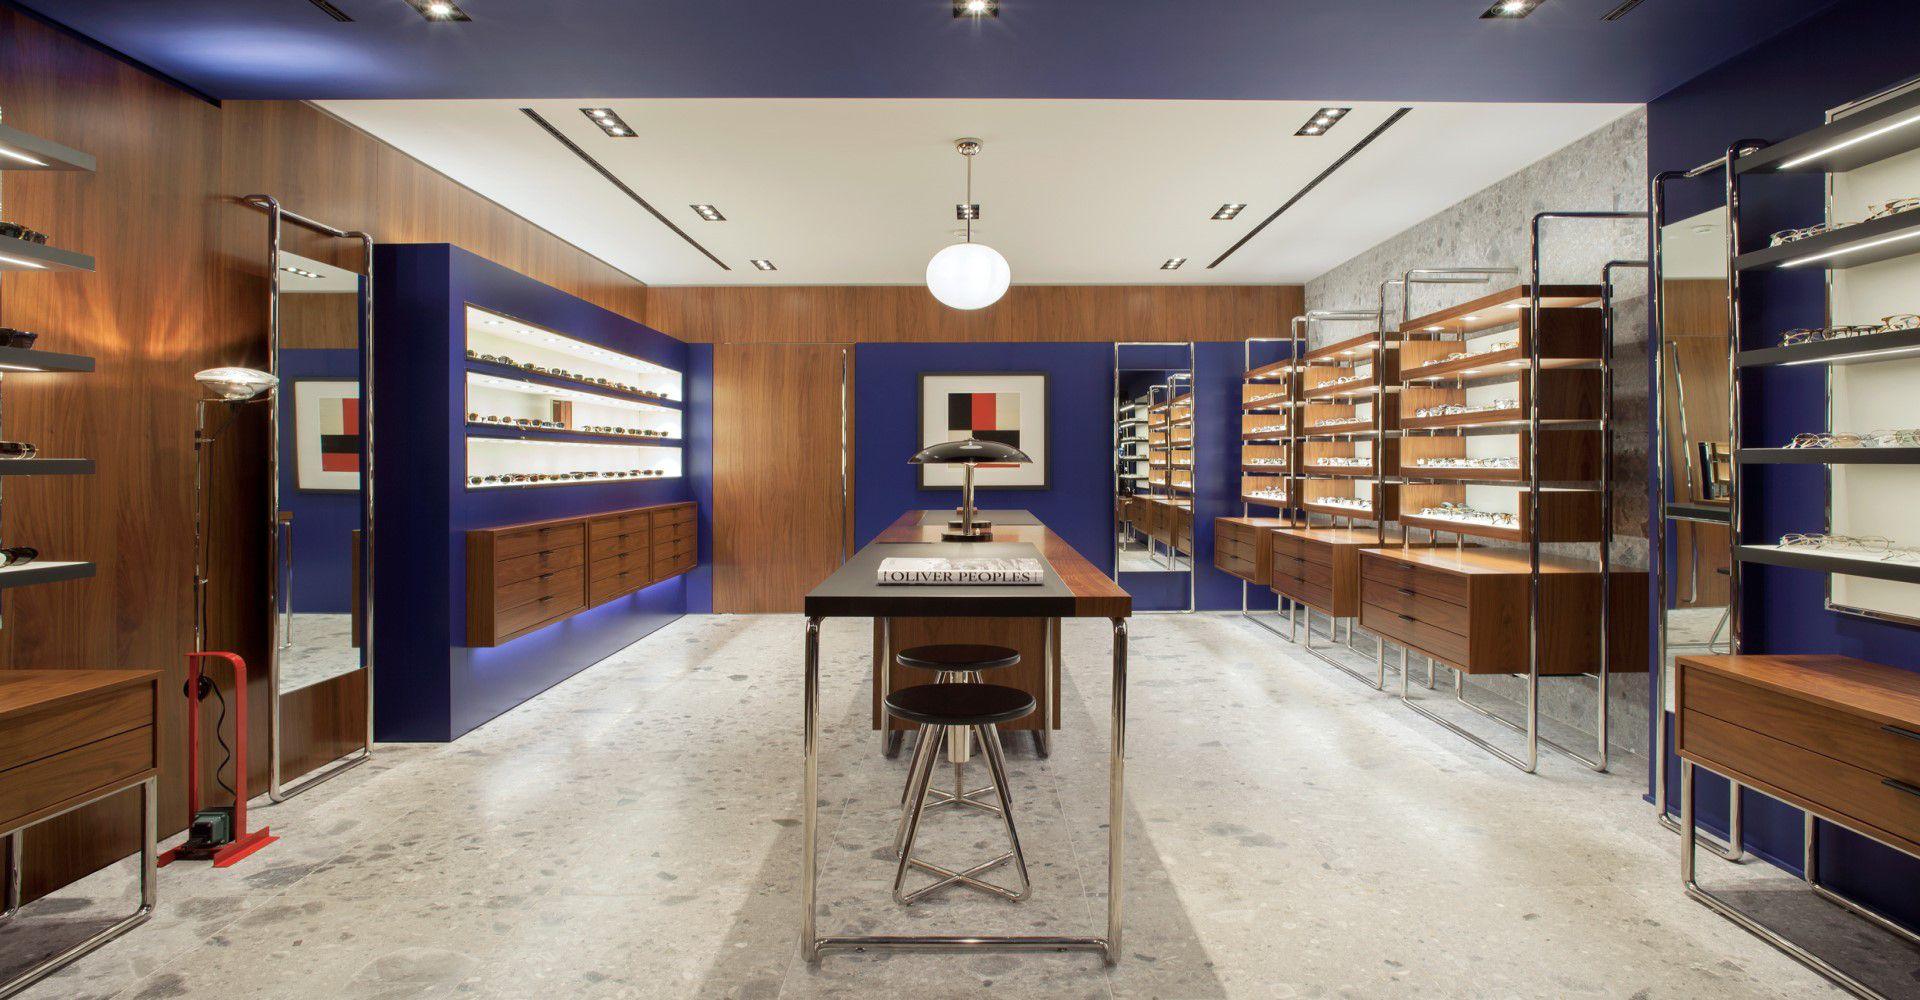 Oliver Peoples Shops at Berlin